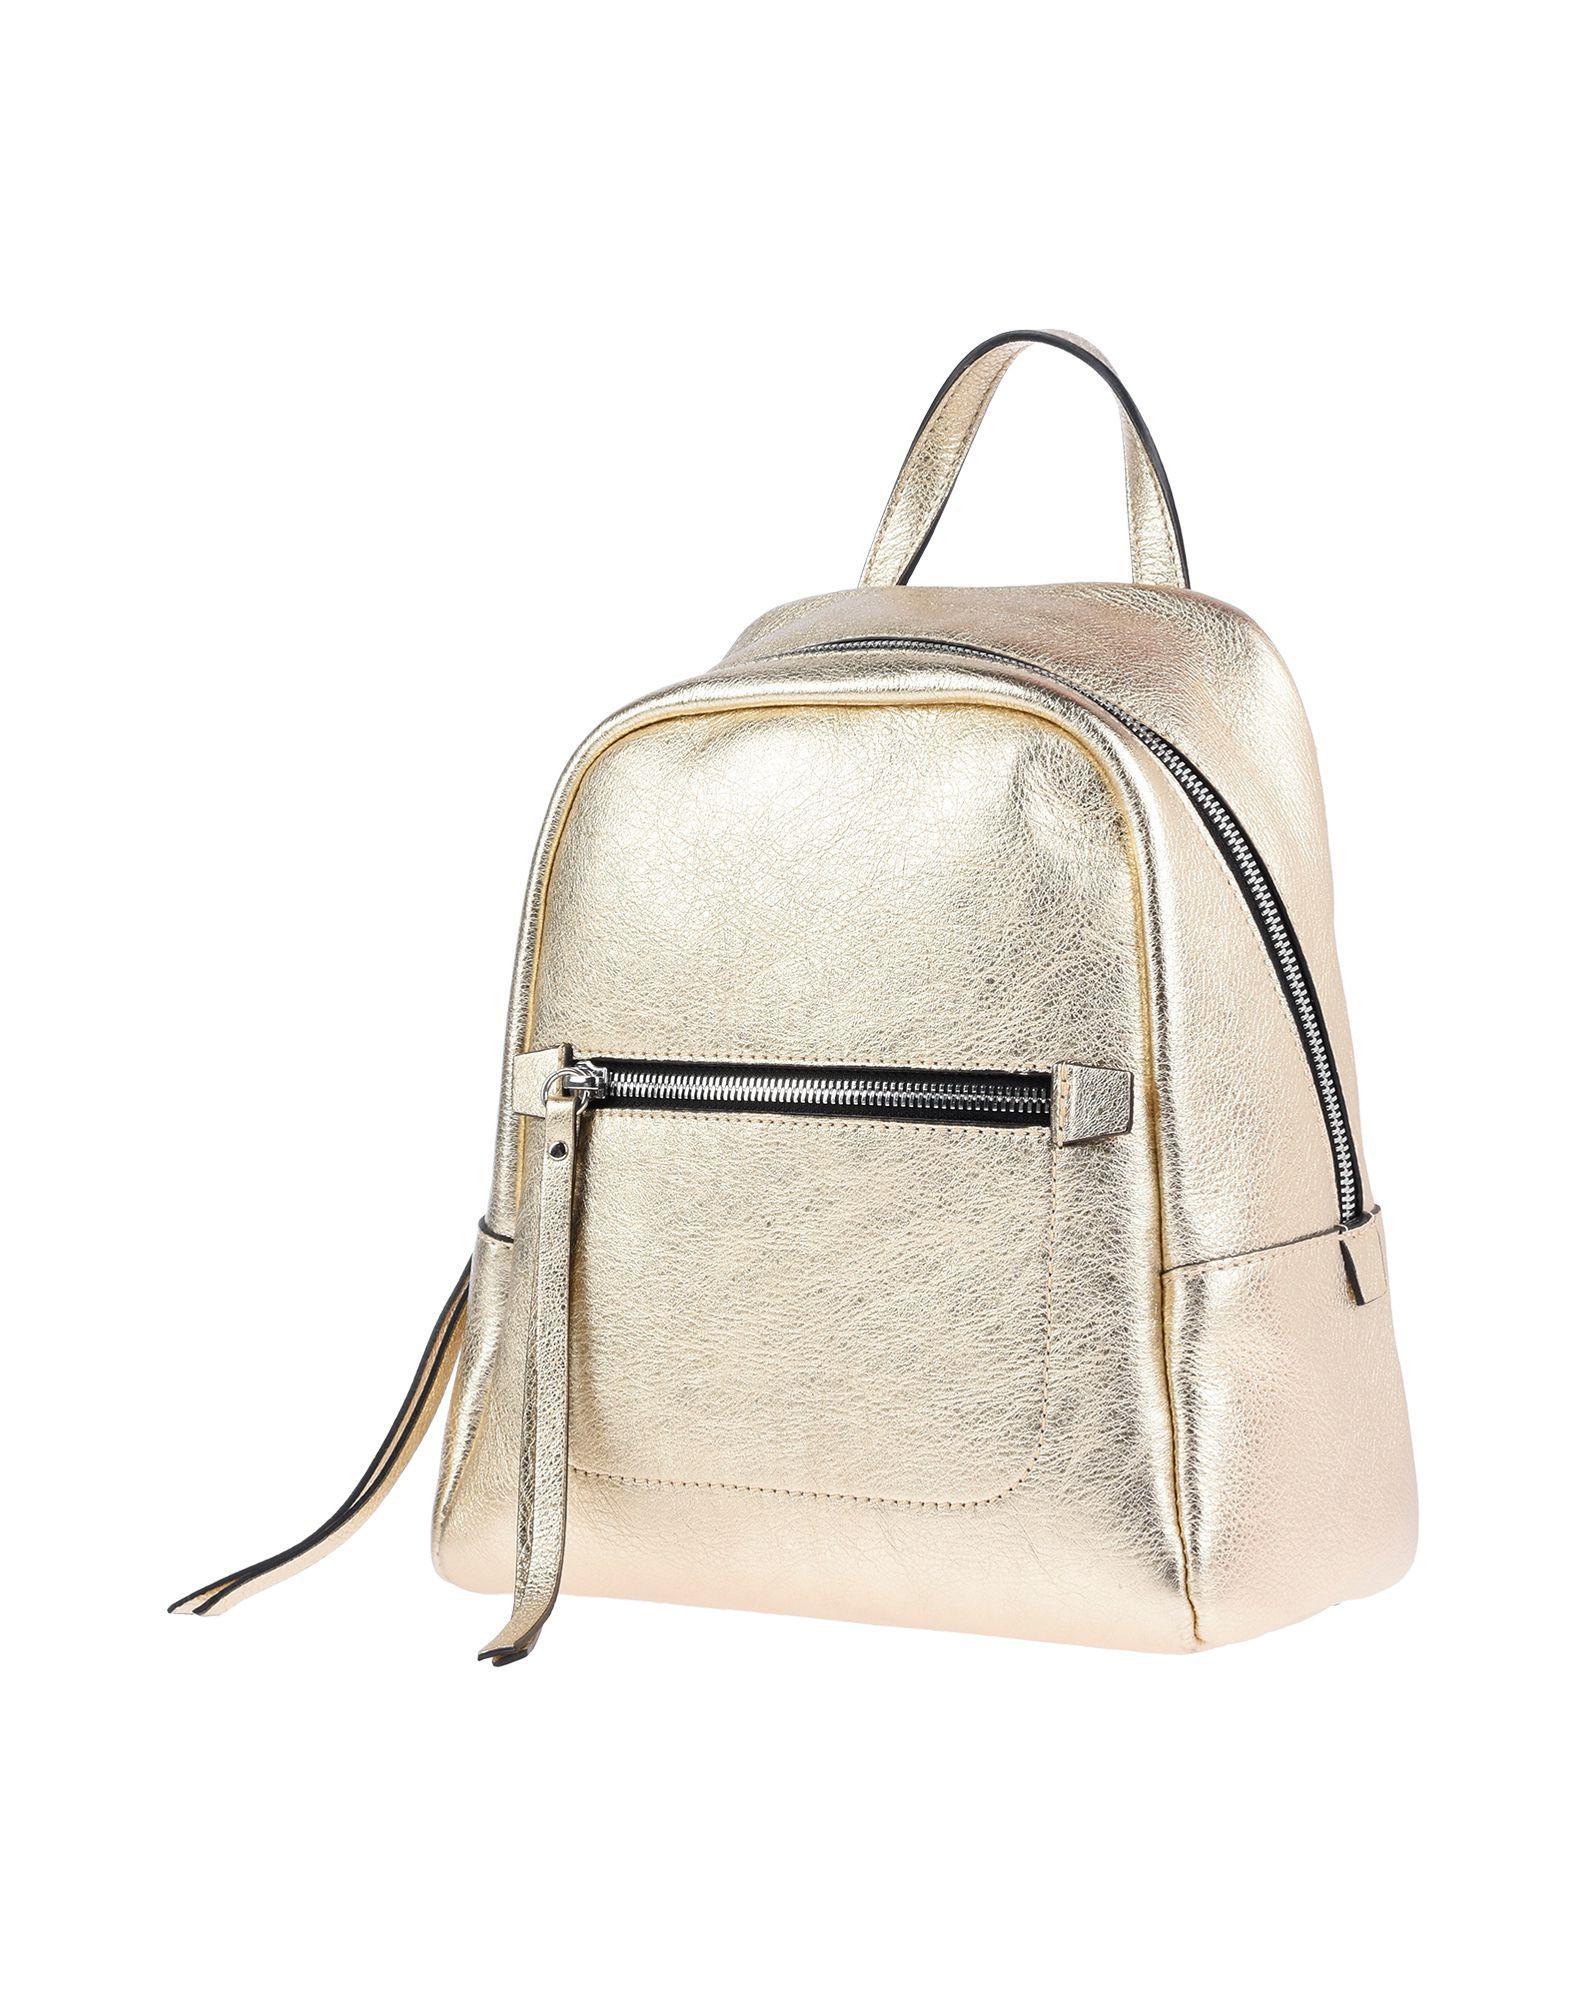 Natural In Lyst Backpacks Gianni Bags Chiarini amp; Bum wTz47Yq